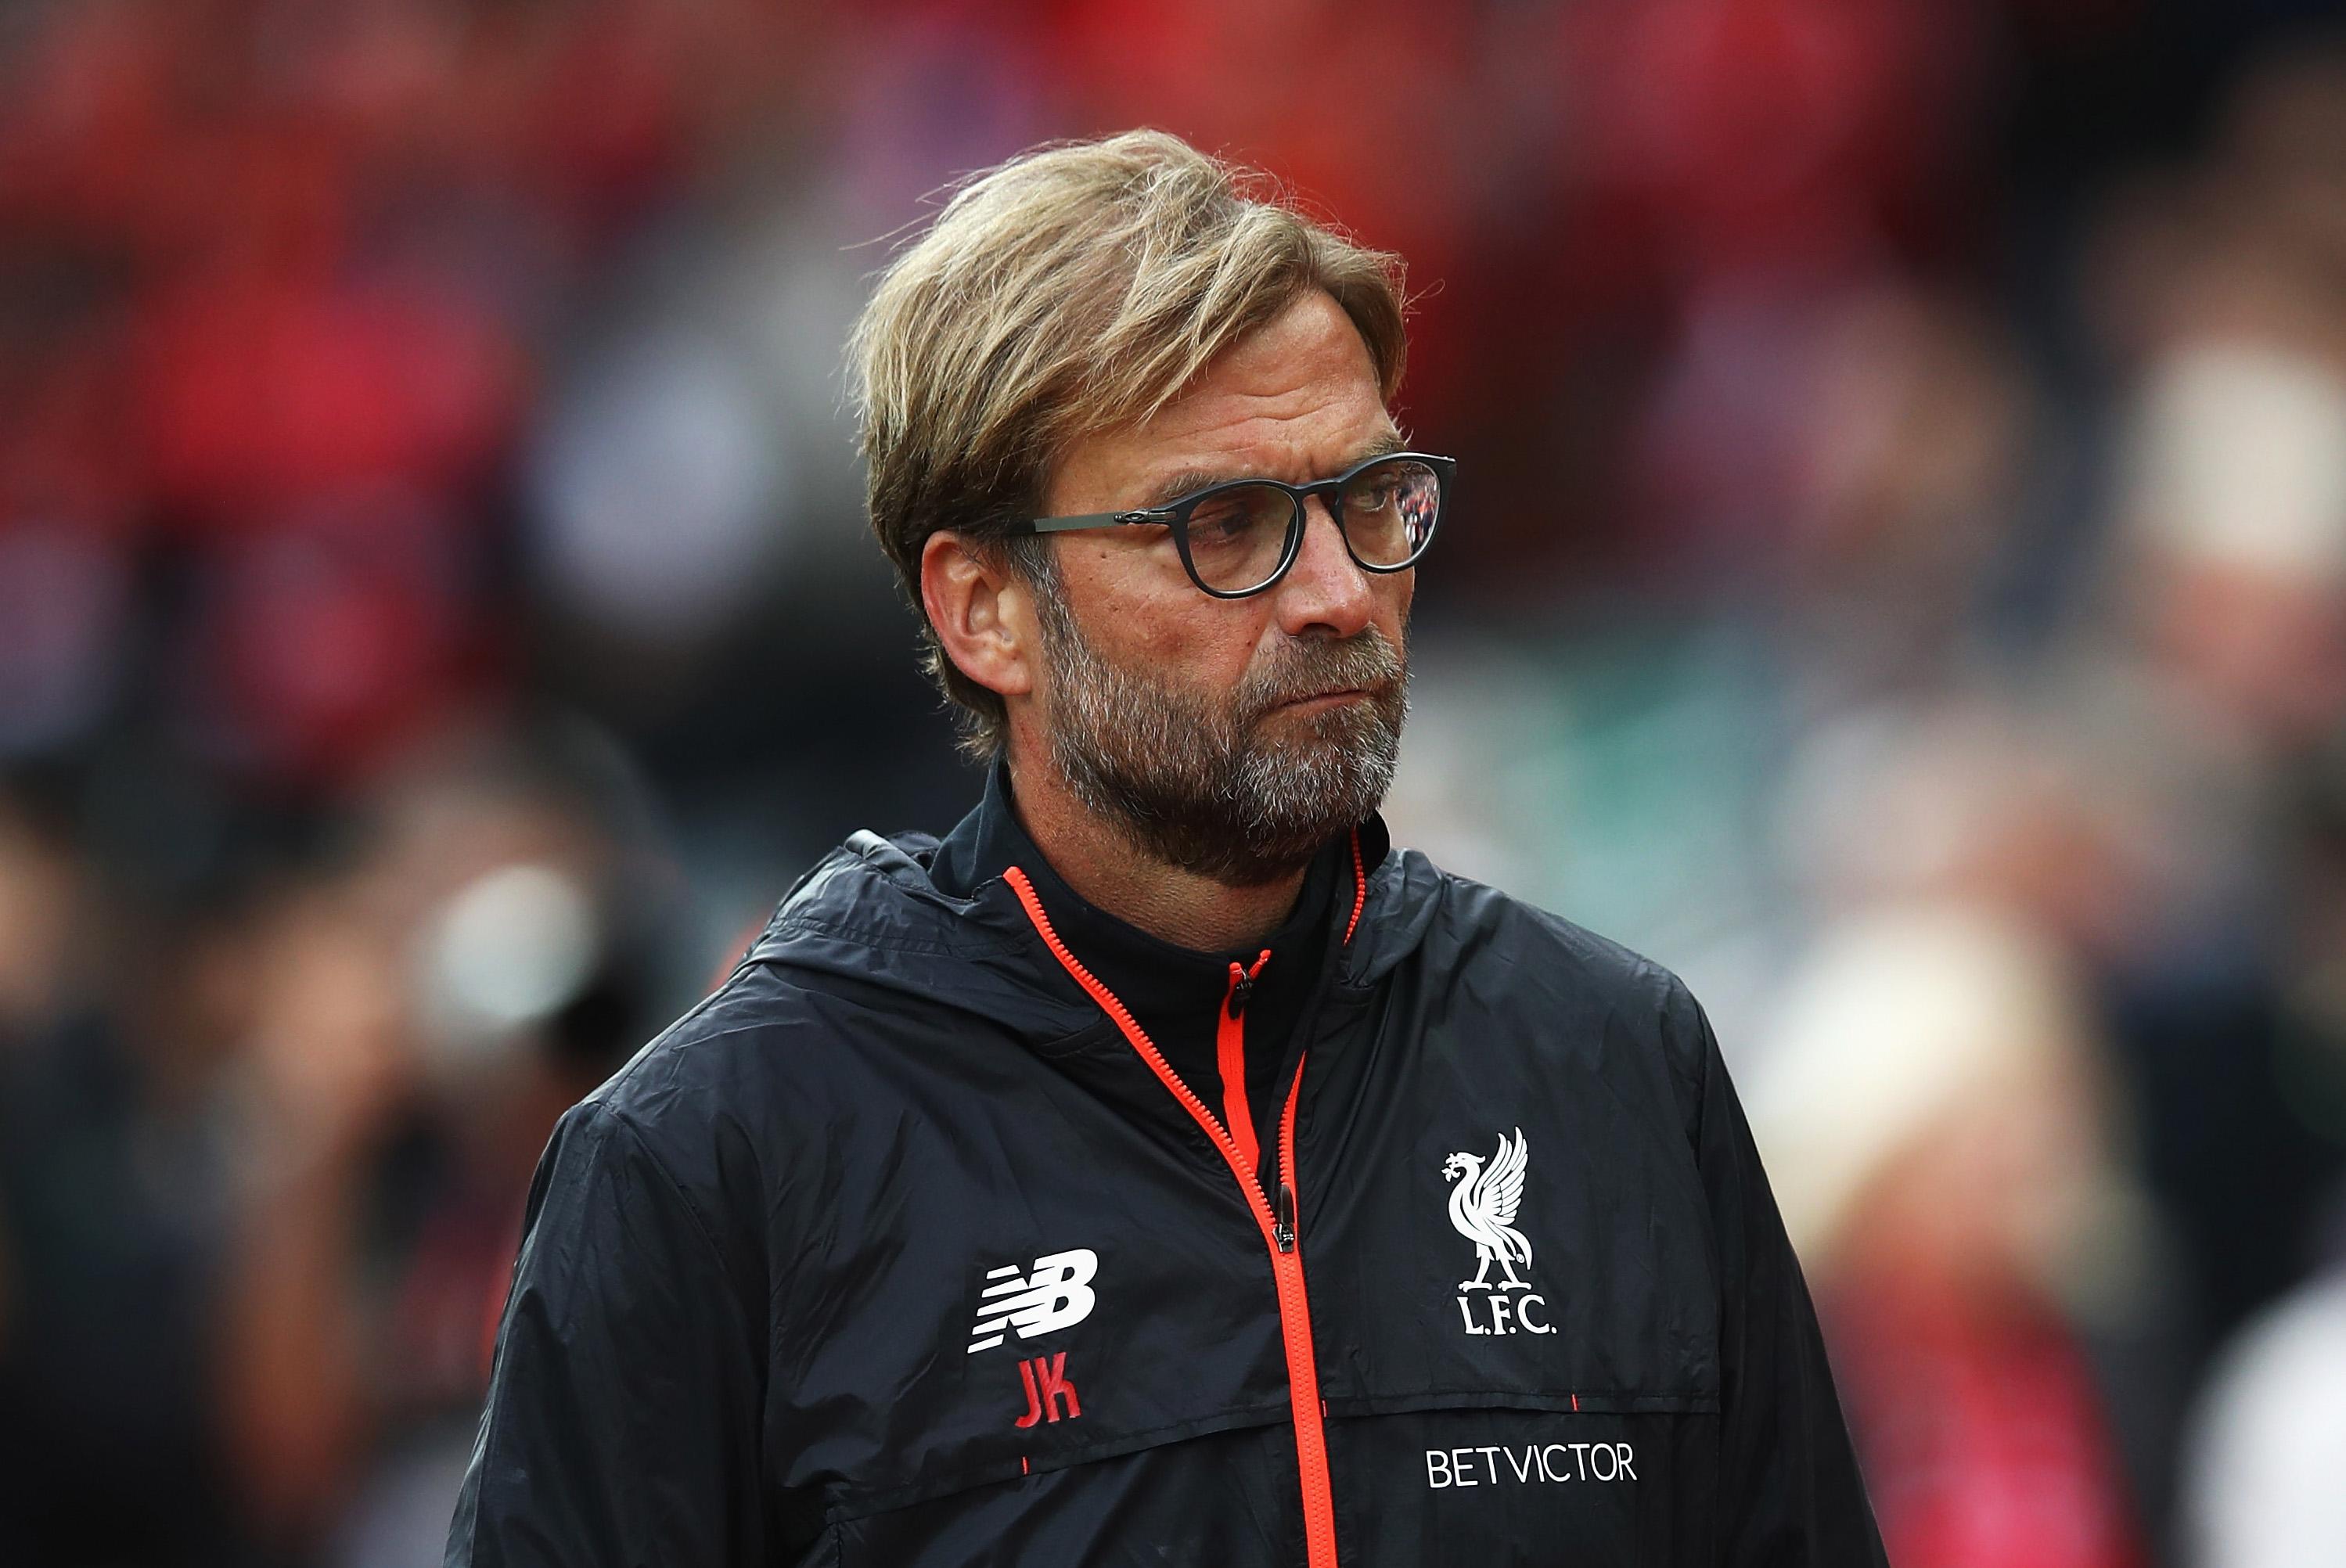 Jurgen Klopp reveals Divock Origi is a concern as Liverpool look to maintain winning streak